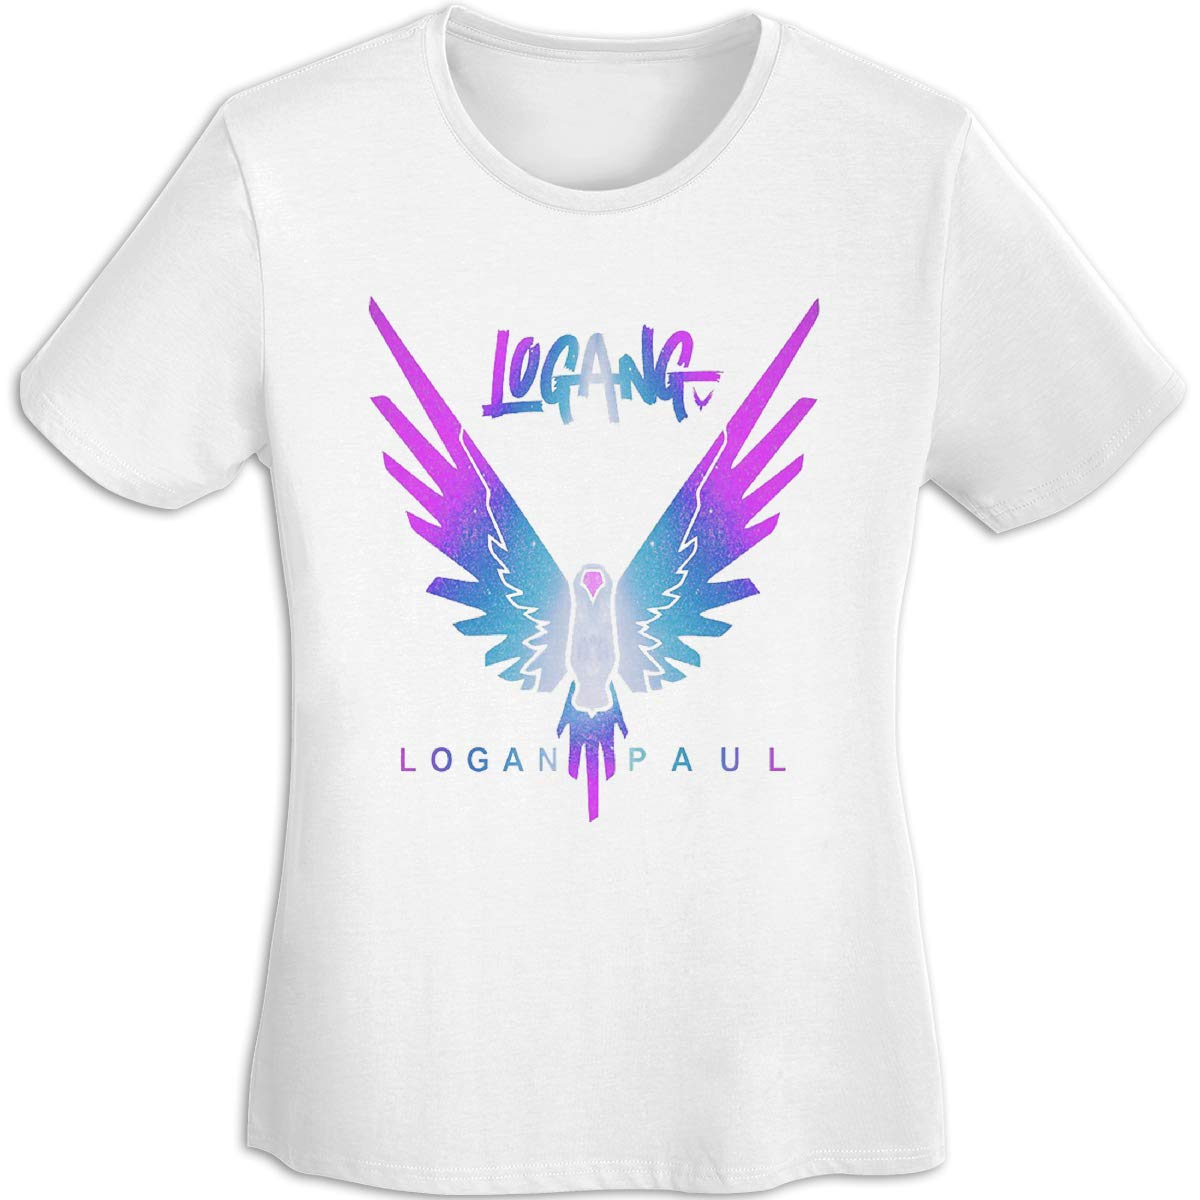 Women's T Shirt Jake Paul Logang Logan Paul Maverick Tee Shirts T-Shirt Short-Sleeve Round Neck Tshirt for Womens Girls White L by BKashy